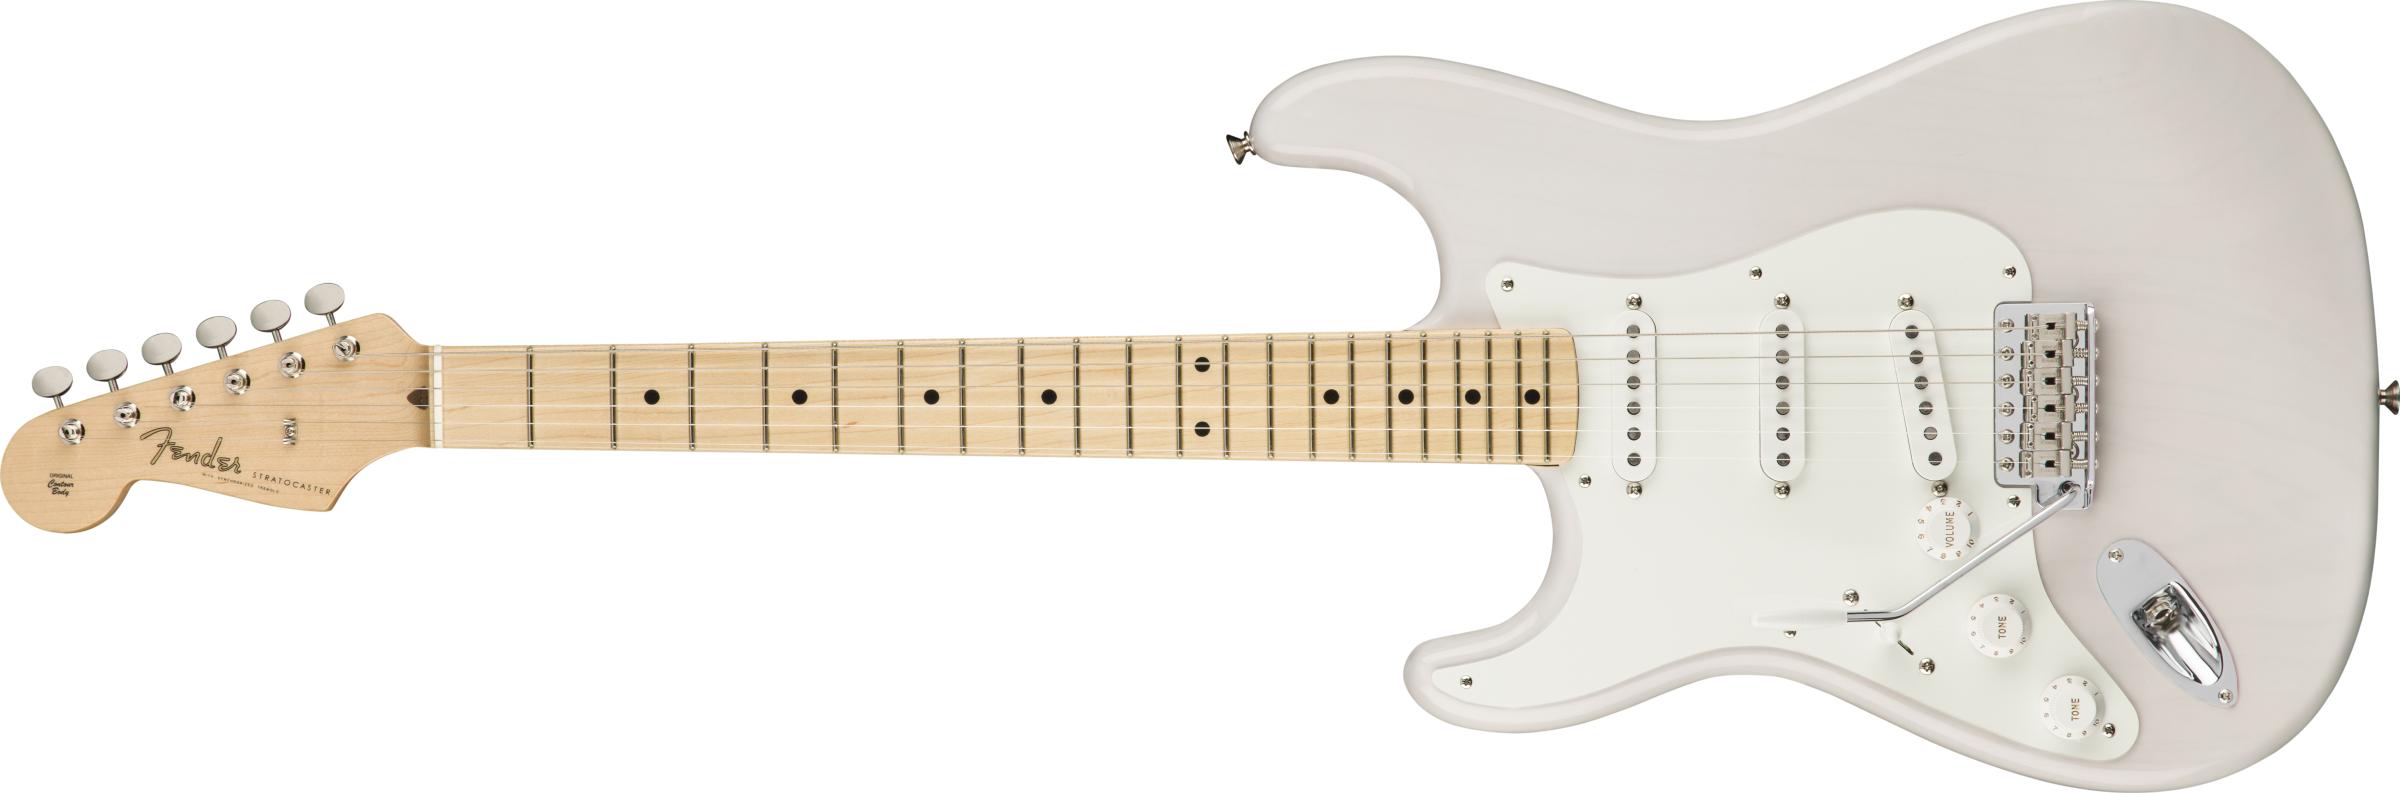 FENDER-American-Original-50s-Stratocaster-Left-Hand-Maple-Fingerboard-White-Blonde-sku-571000285